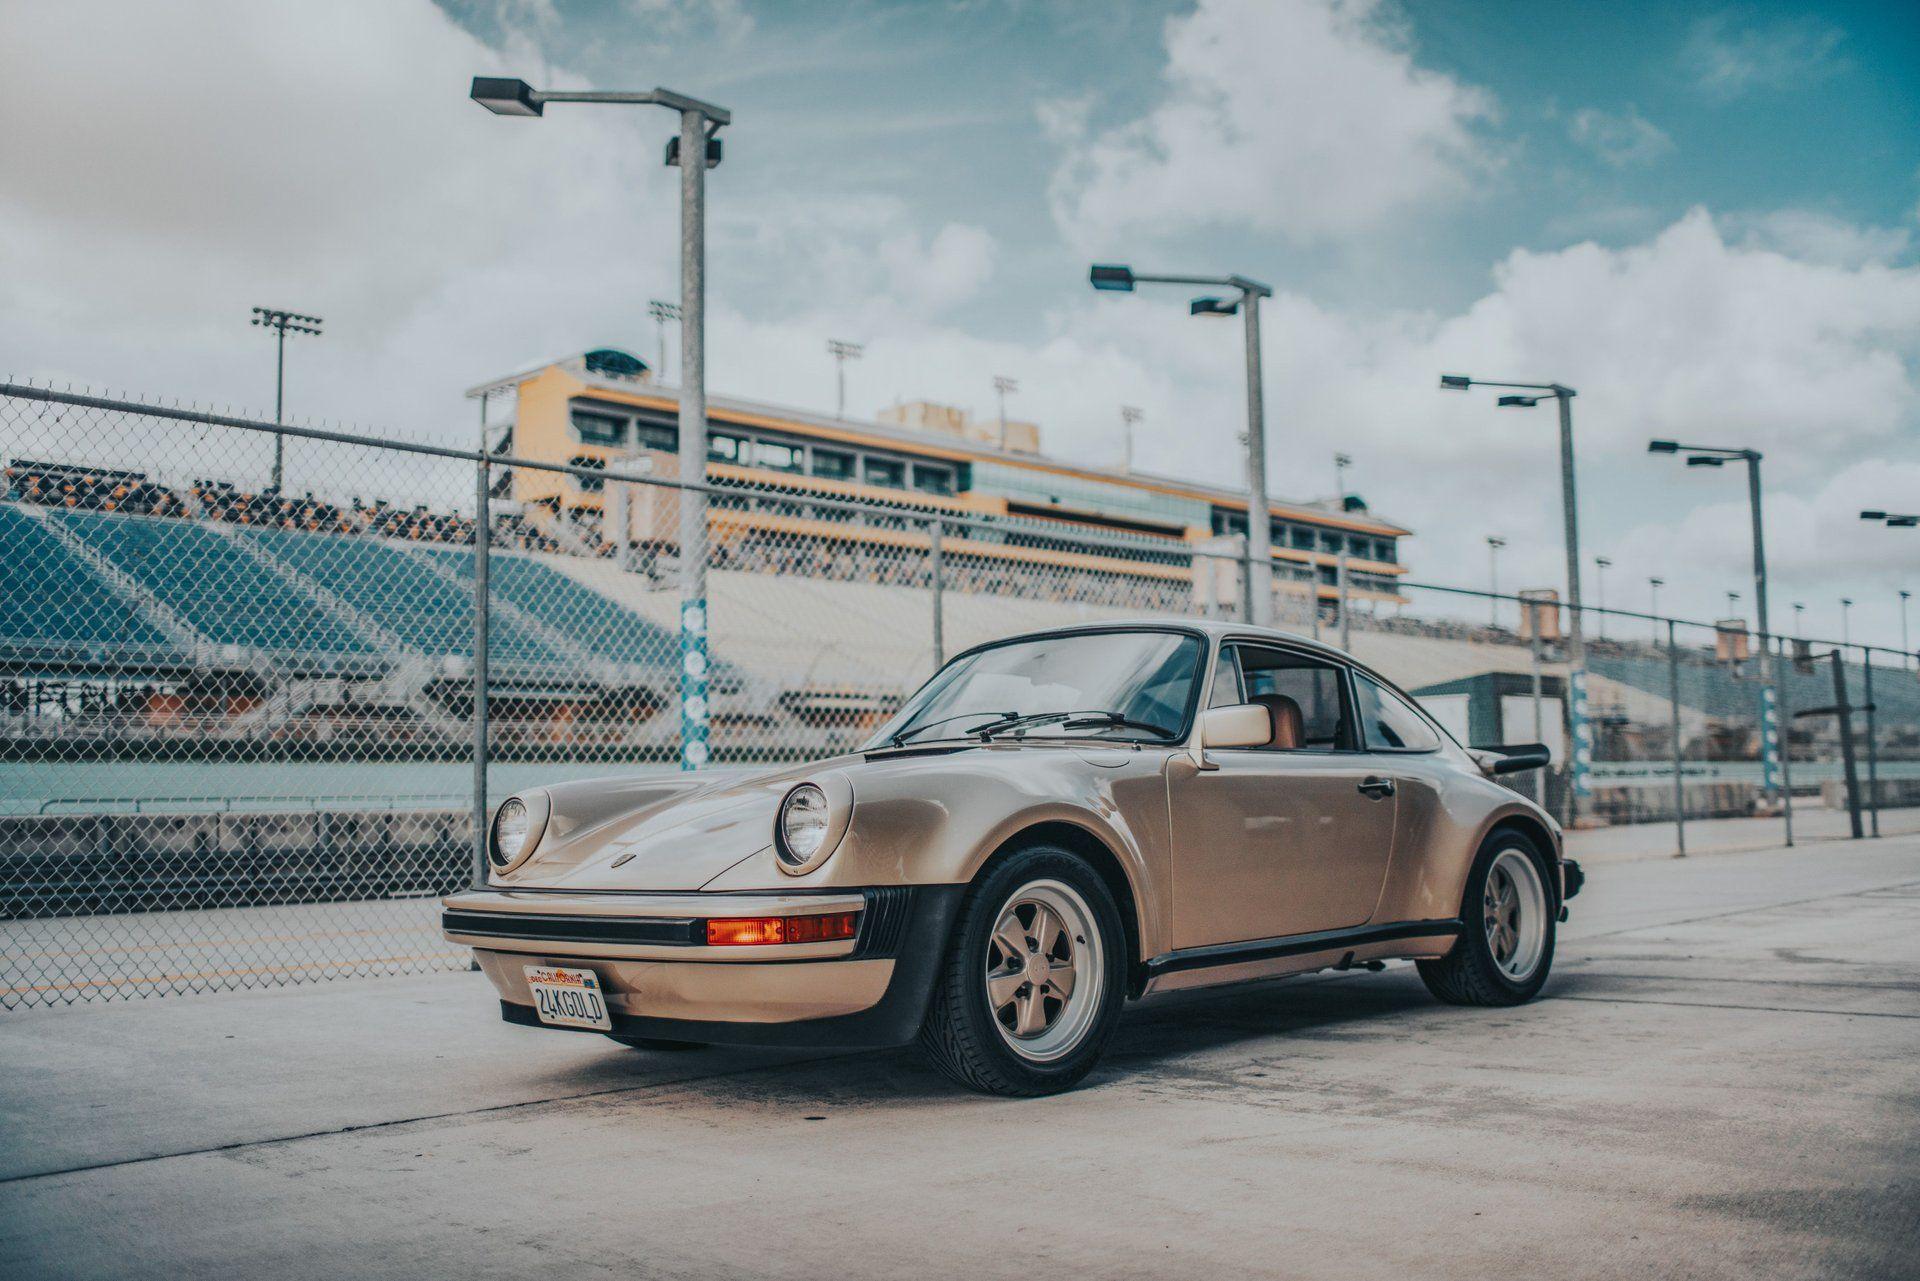 "<img src=""1976-porsche-911-s-signature-edition.jpeg"" alt=""A stunning 1976 Porsche 911 S Signature Edition"">"